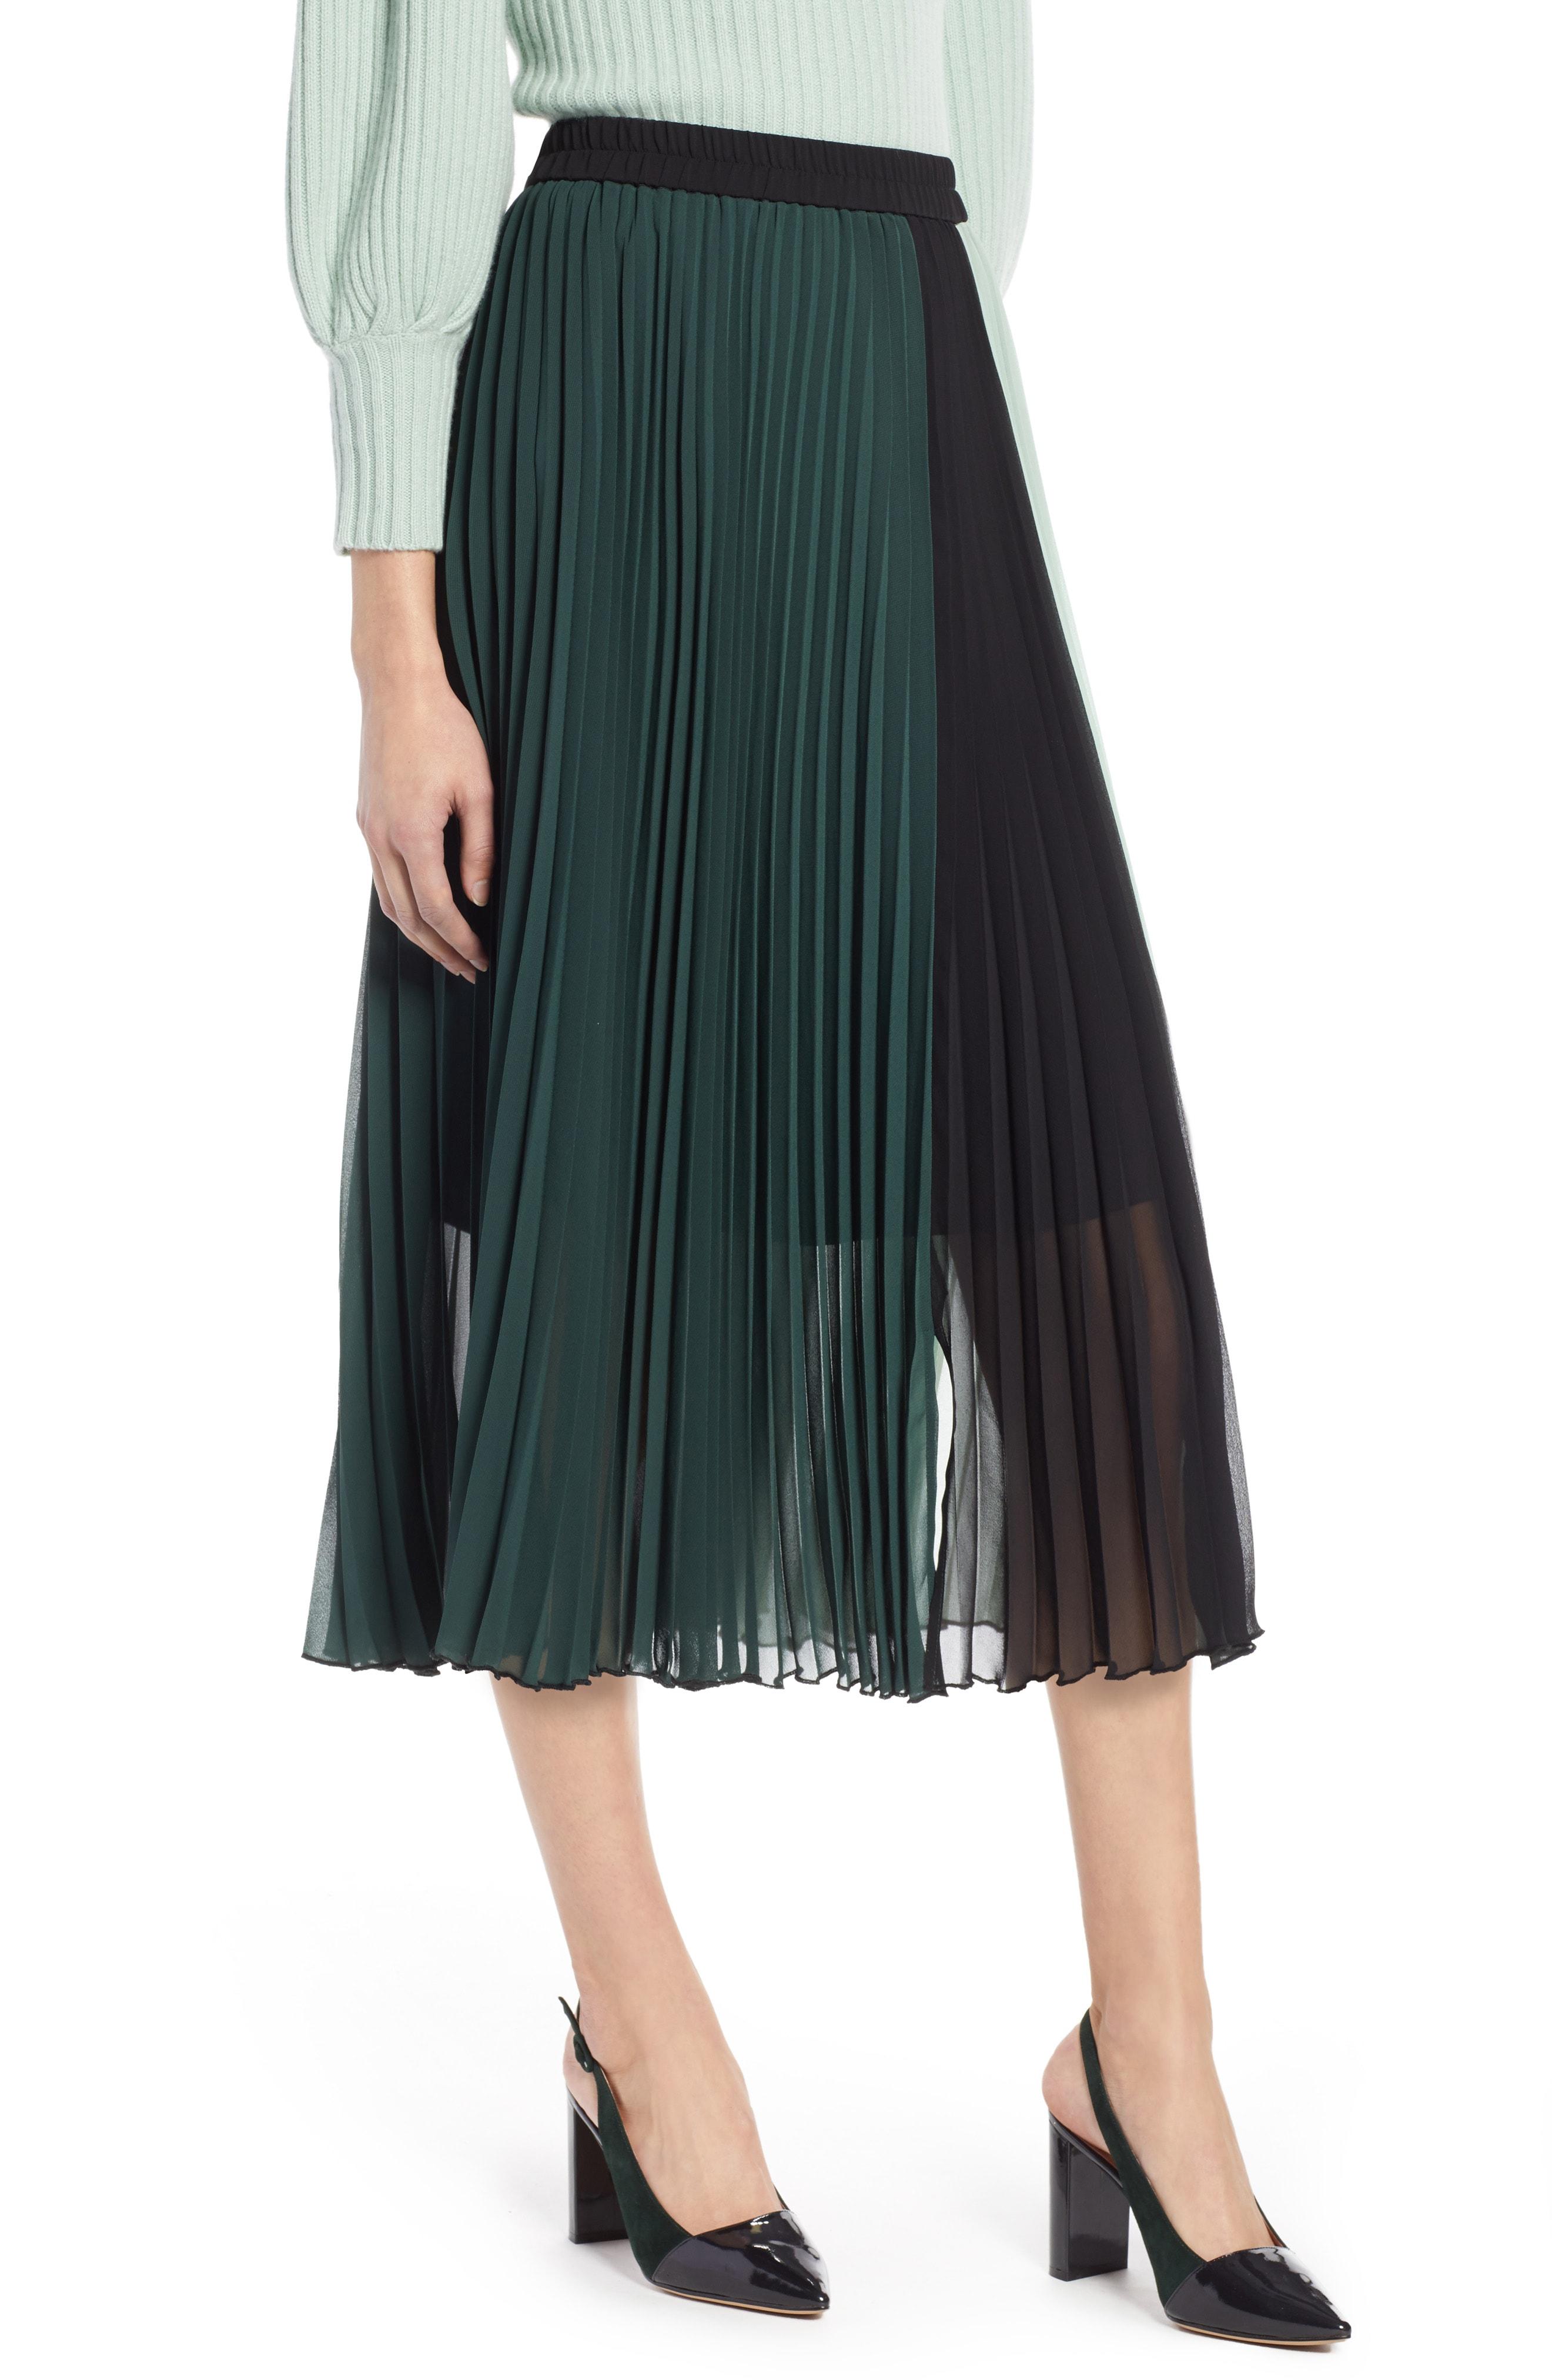 Halogen x Atlantic-Pacific Colorblock Pleated Midi Skirt (Regular & Petite)